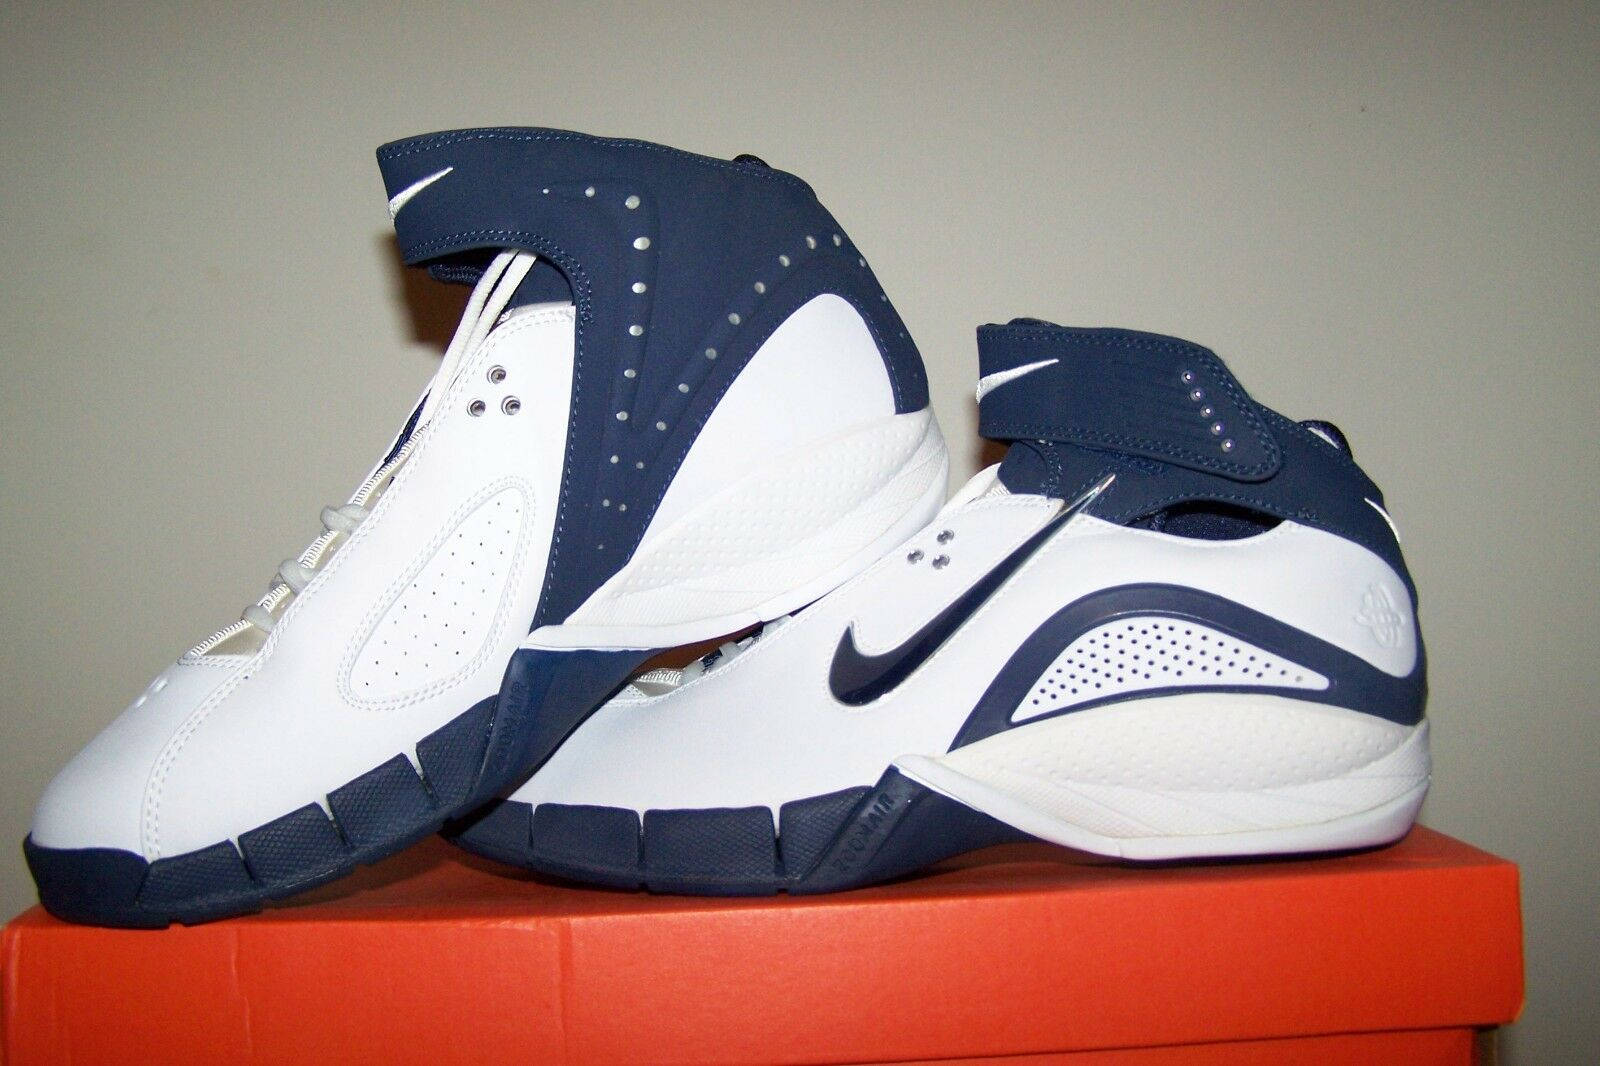 Donna  New Nike Zoom Air Huarache Excel bianca bianca bianca Basketball scarpe with Navy Trim 5afb27